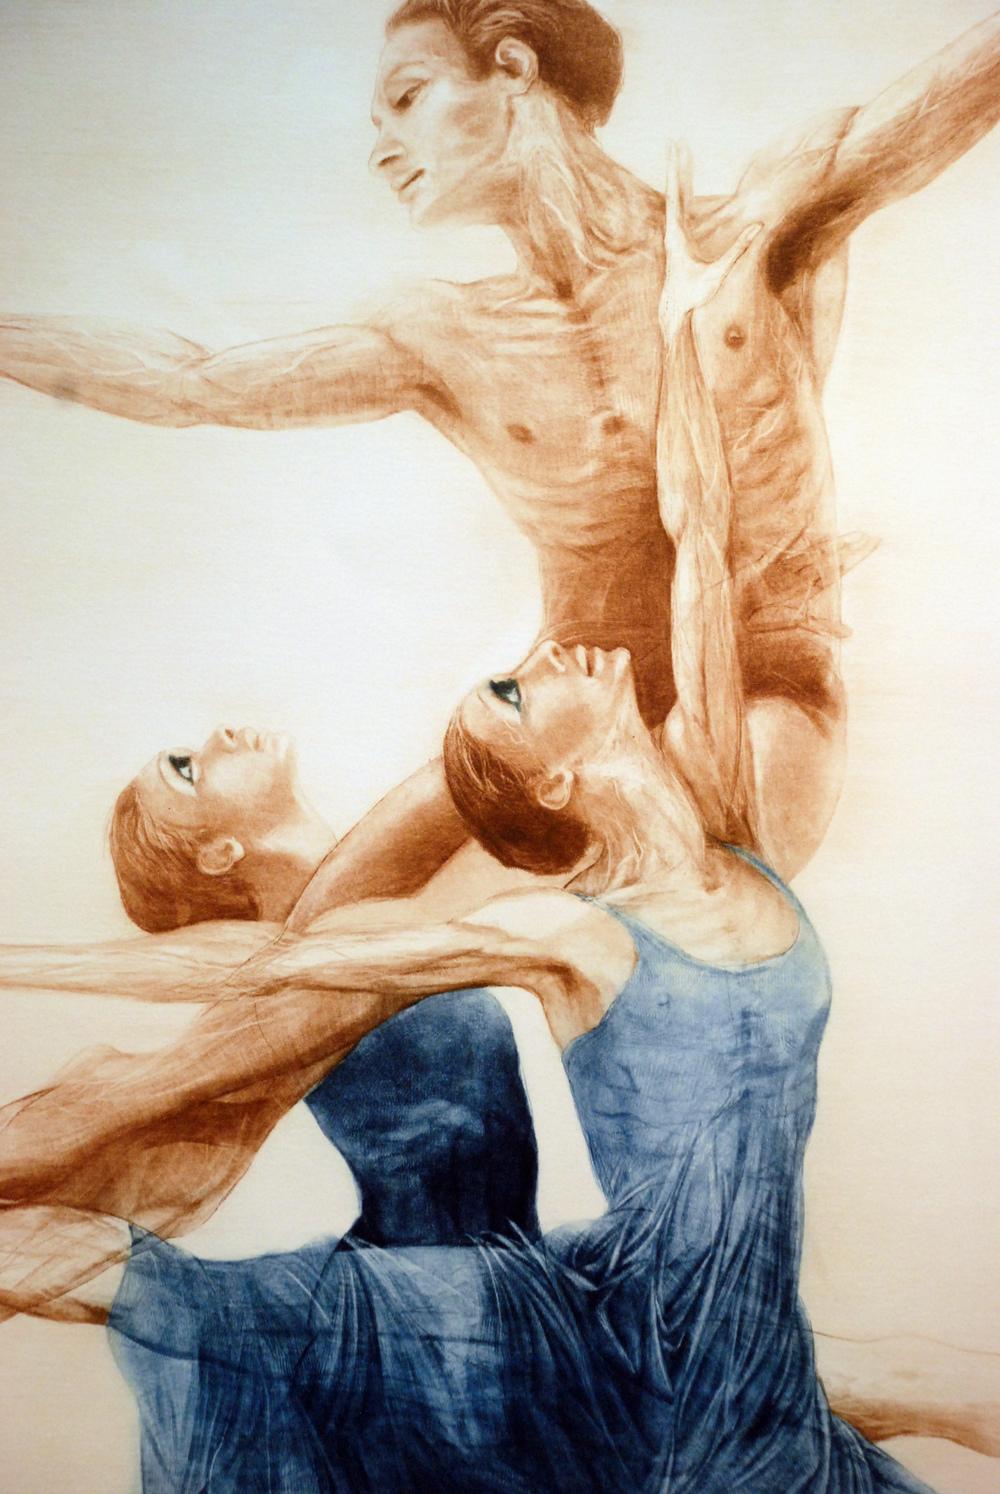 CH-Rothe-BalletinNY1detail.jpg